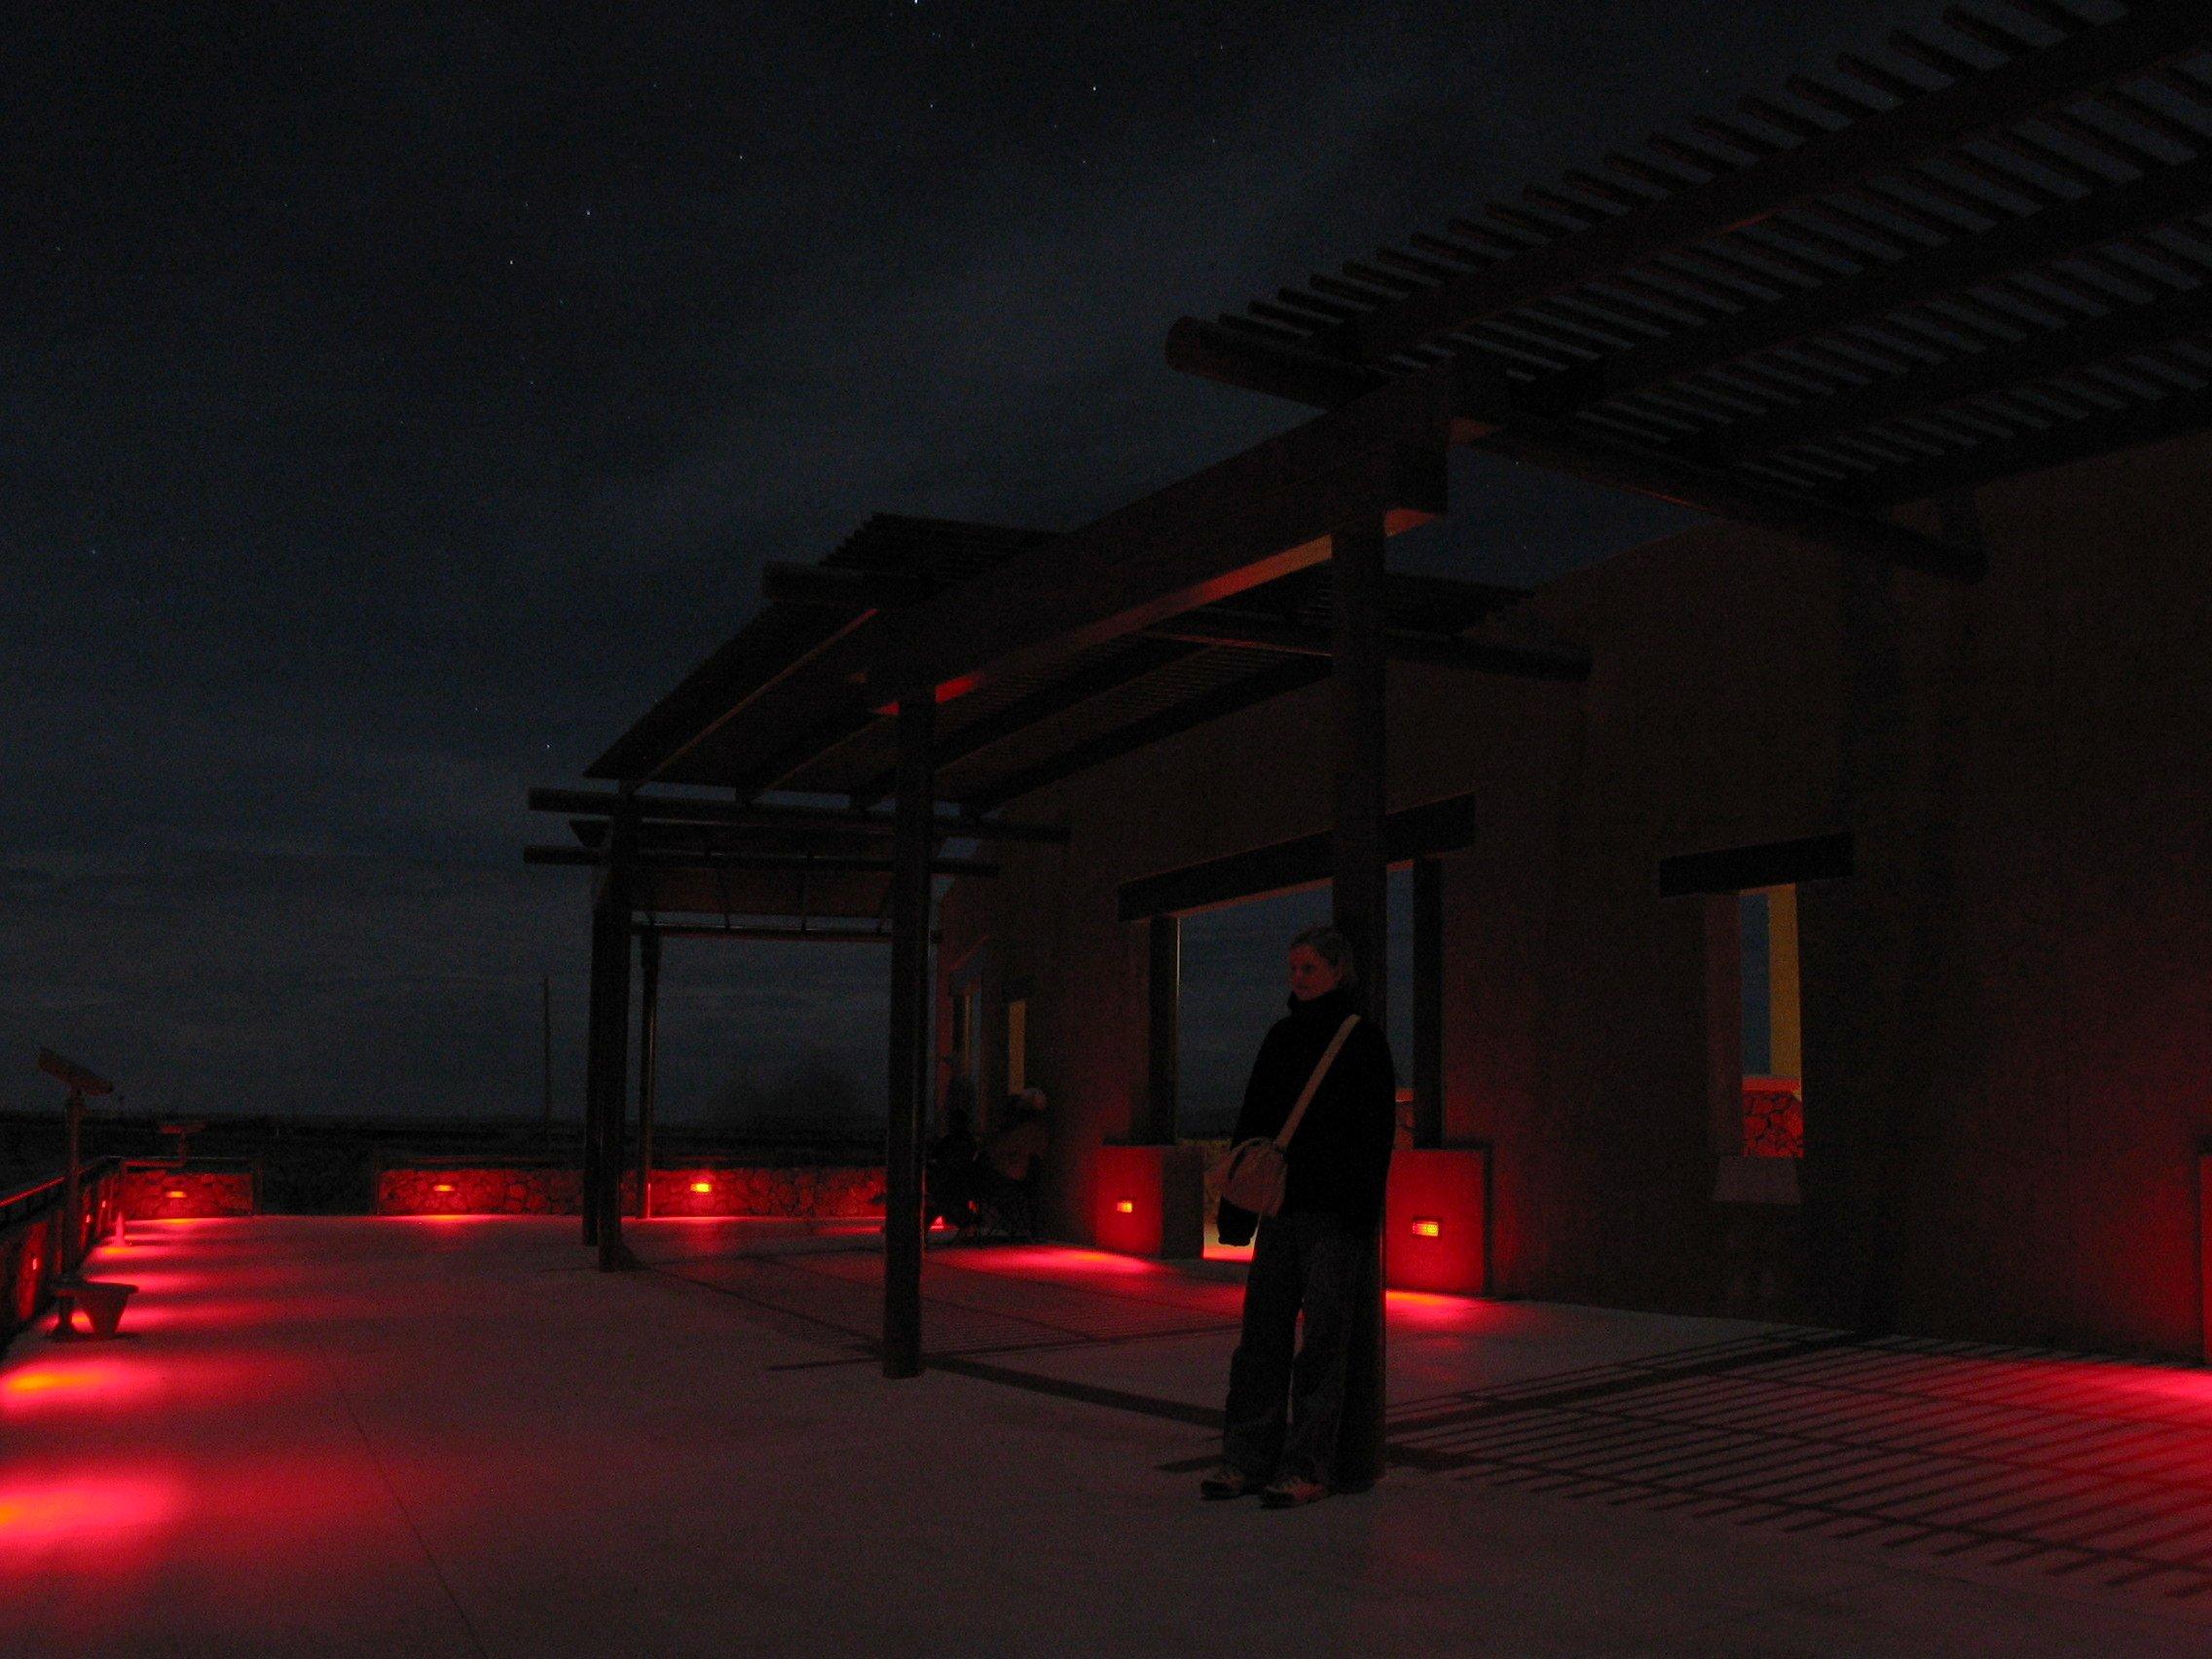 Night light wikipedia - File Usa Marfa Lights Viewing Platform Tx Jpg